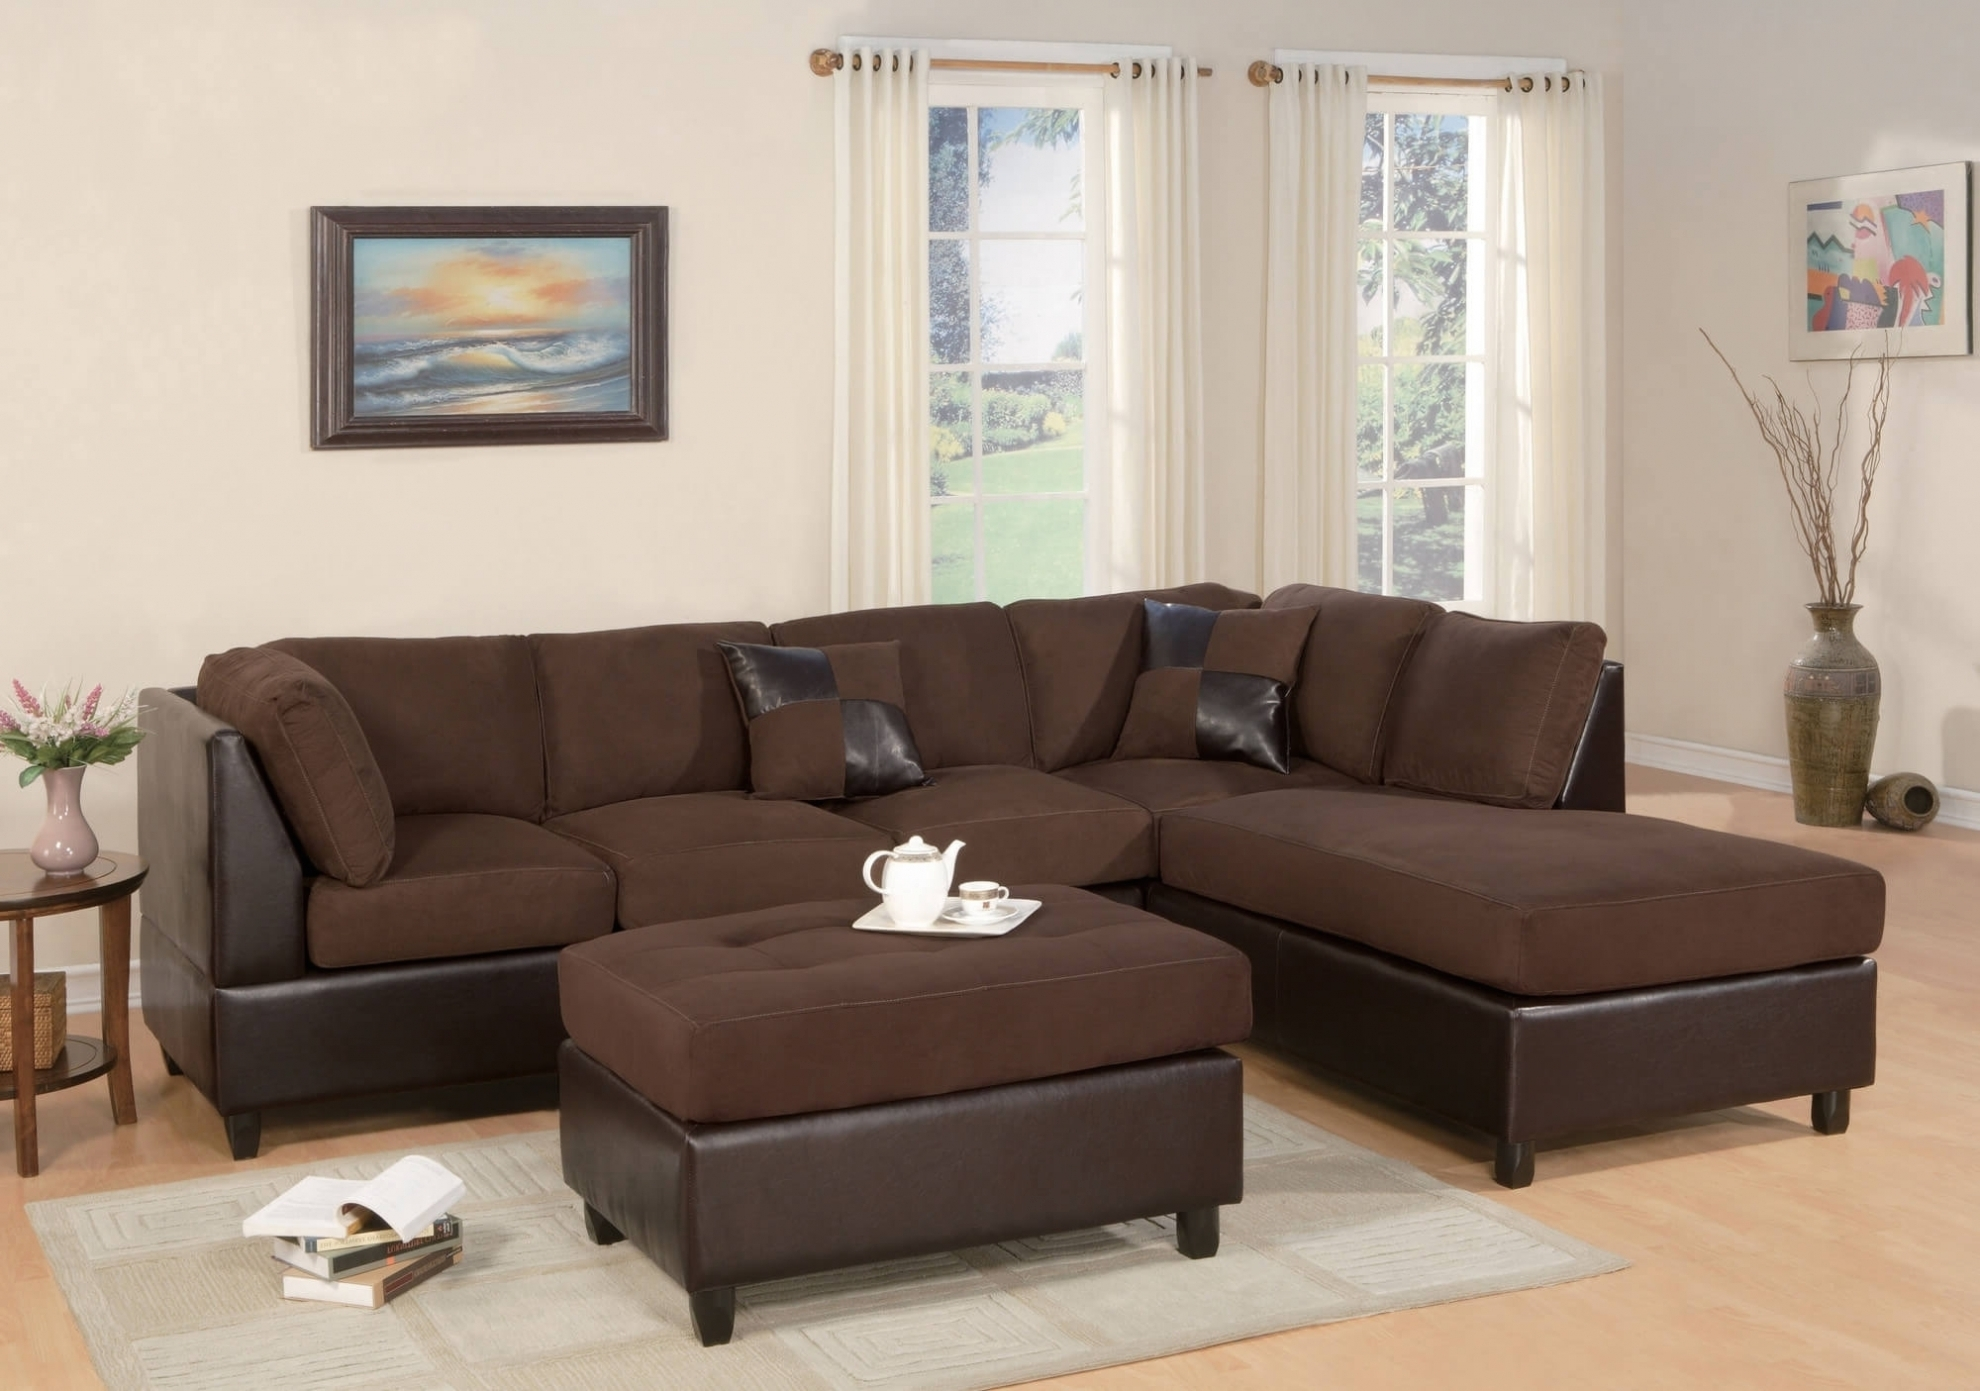 Home Design: Remarkable Photos Sectional Sofas Under $1000 Intended For Sectional Sofas Under (View 7 of 10)